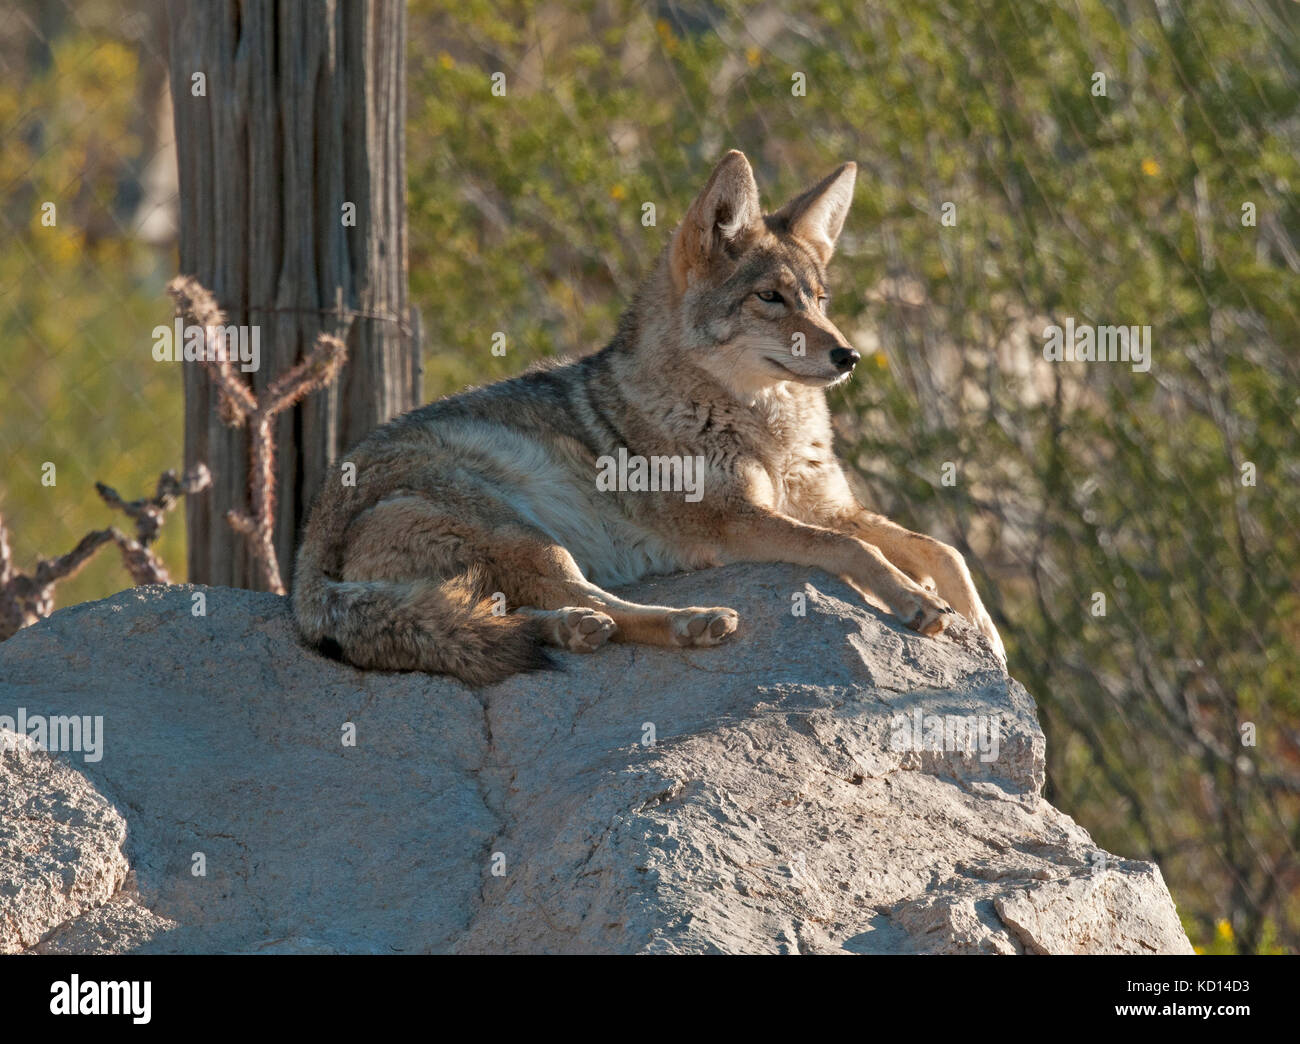 Coyote (Canis latrans), resting but alert at the Arizona Sonoran Desert Museum, Tucson, AZ - Stock Image